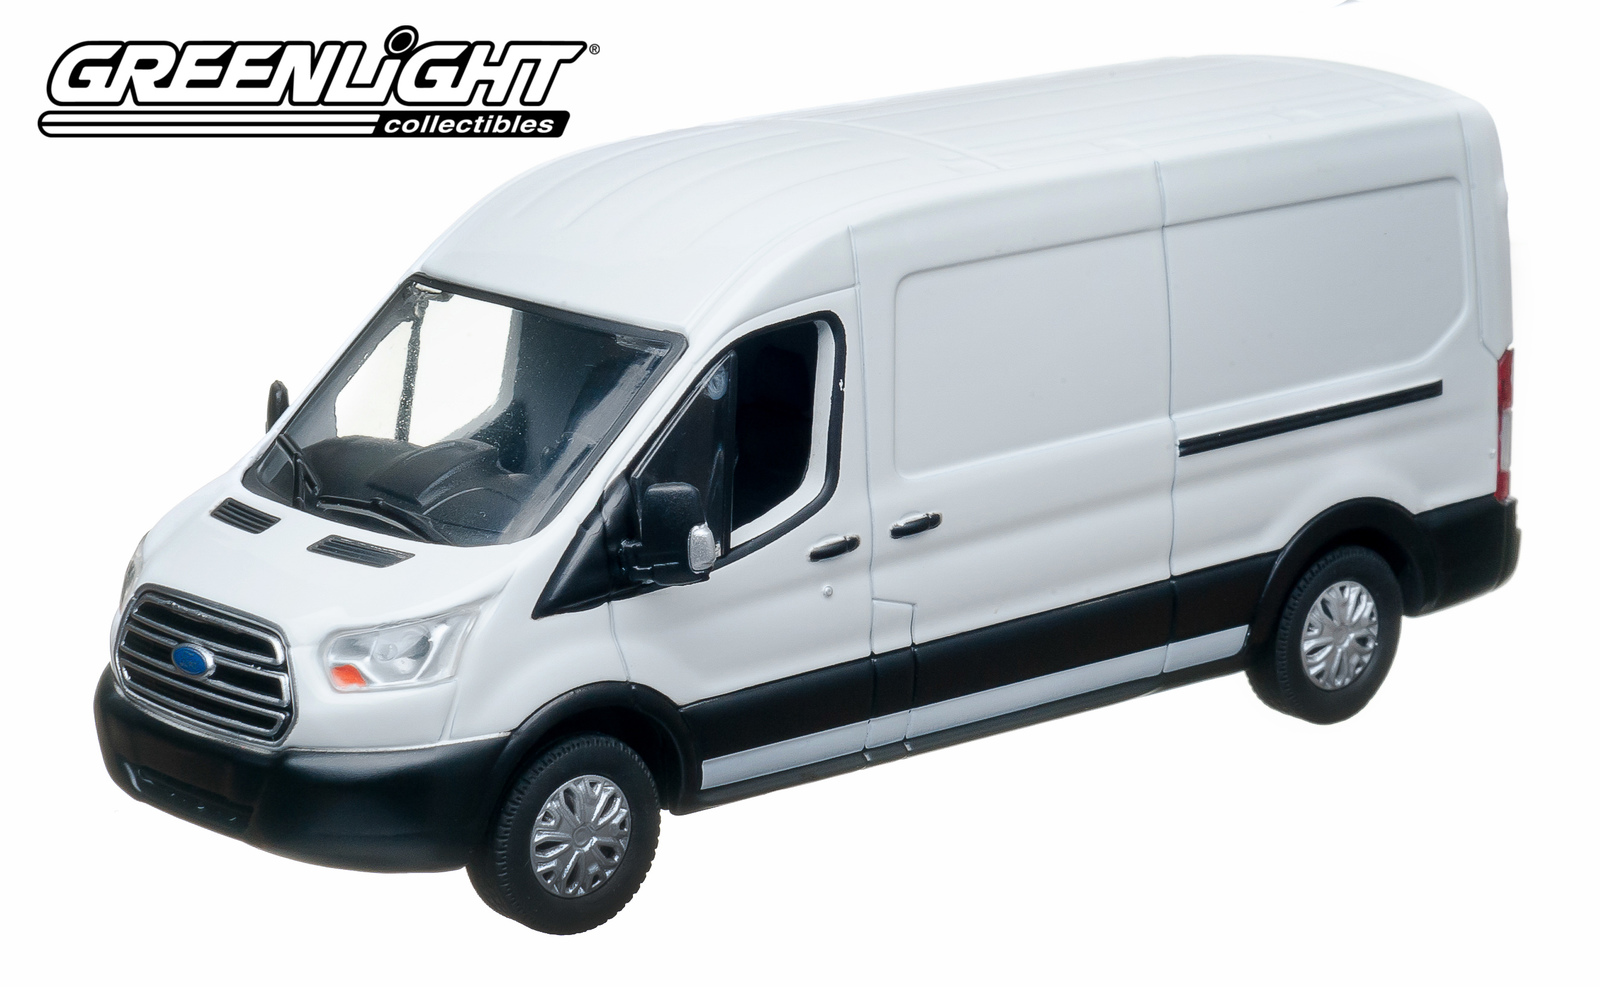 1/43: 2015 Ford Transit (V363) - Diecast Model image